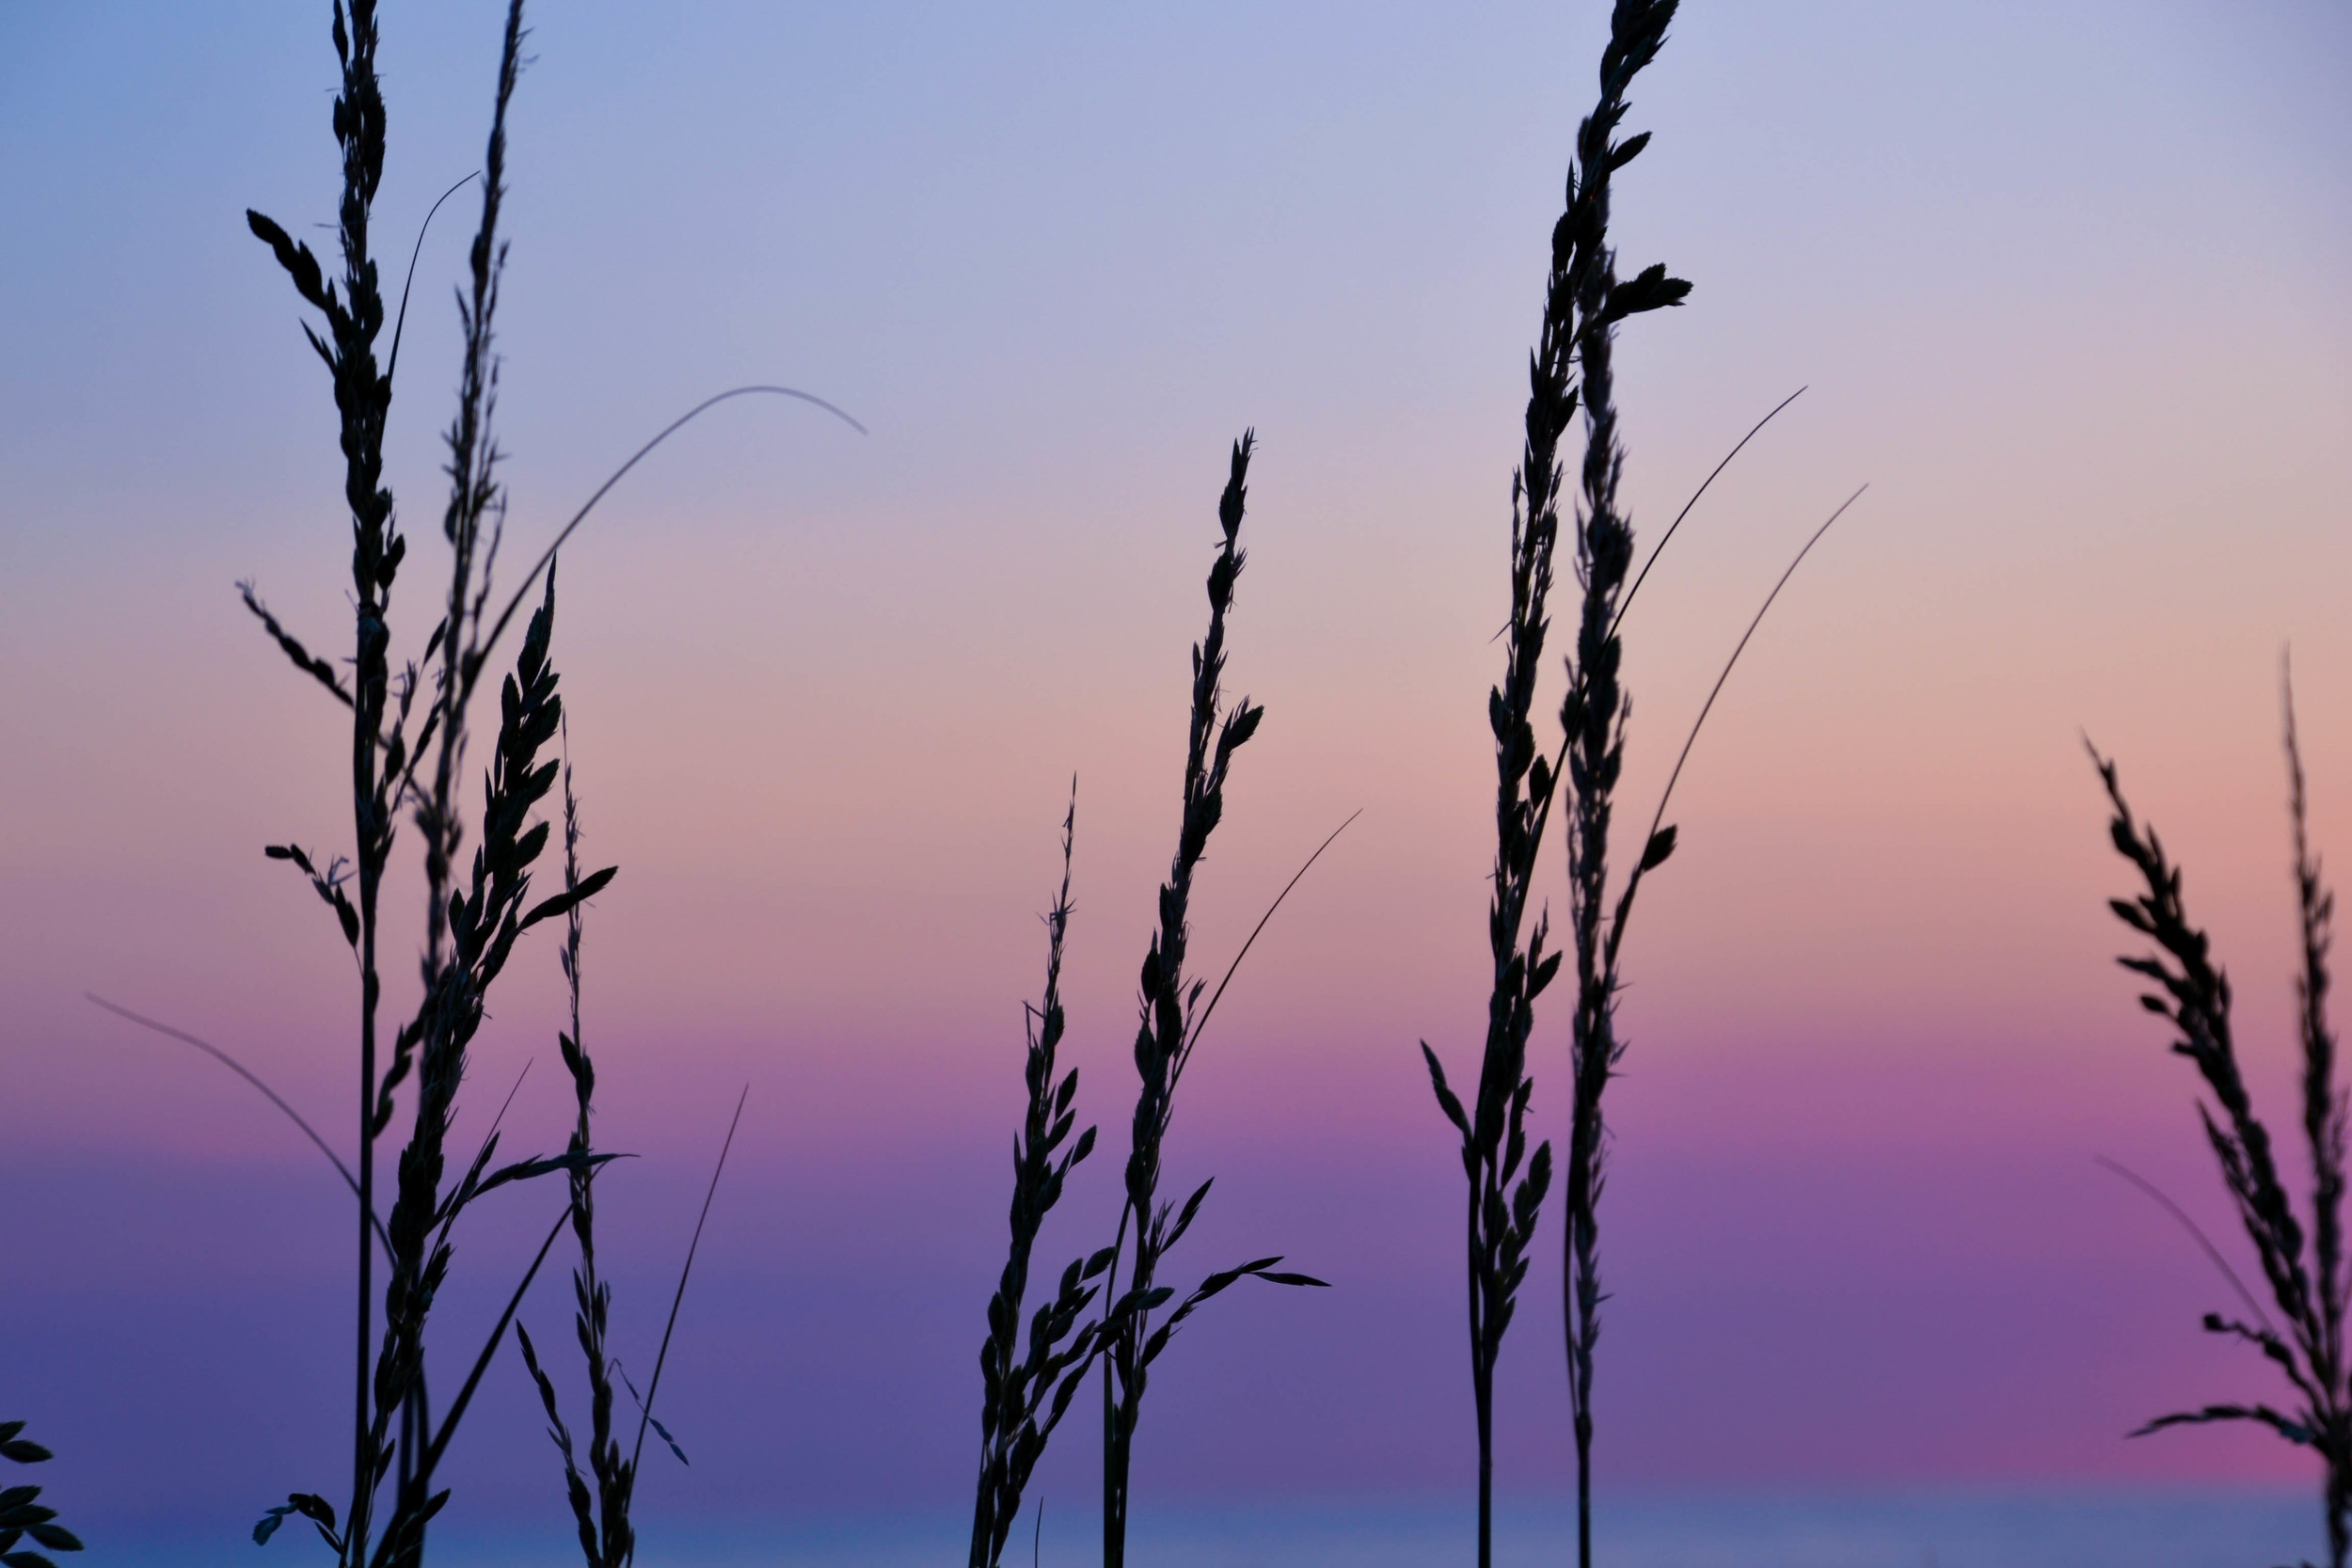 sunrise - obx-15.jpg